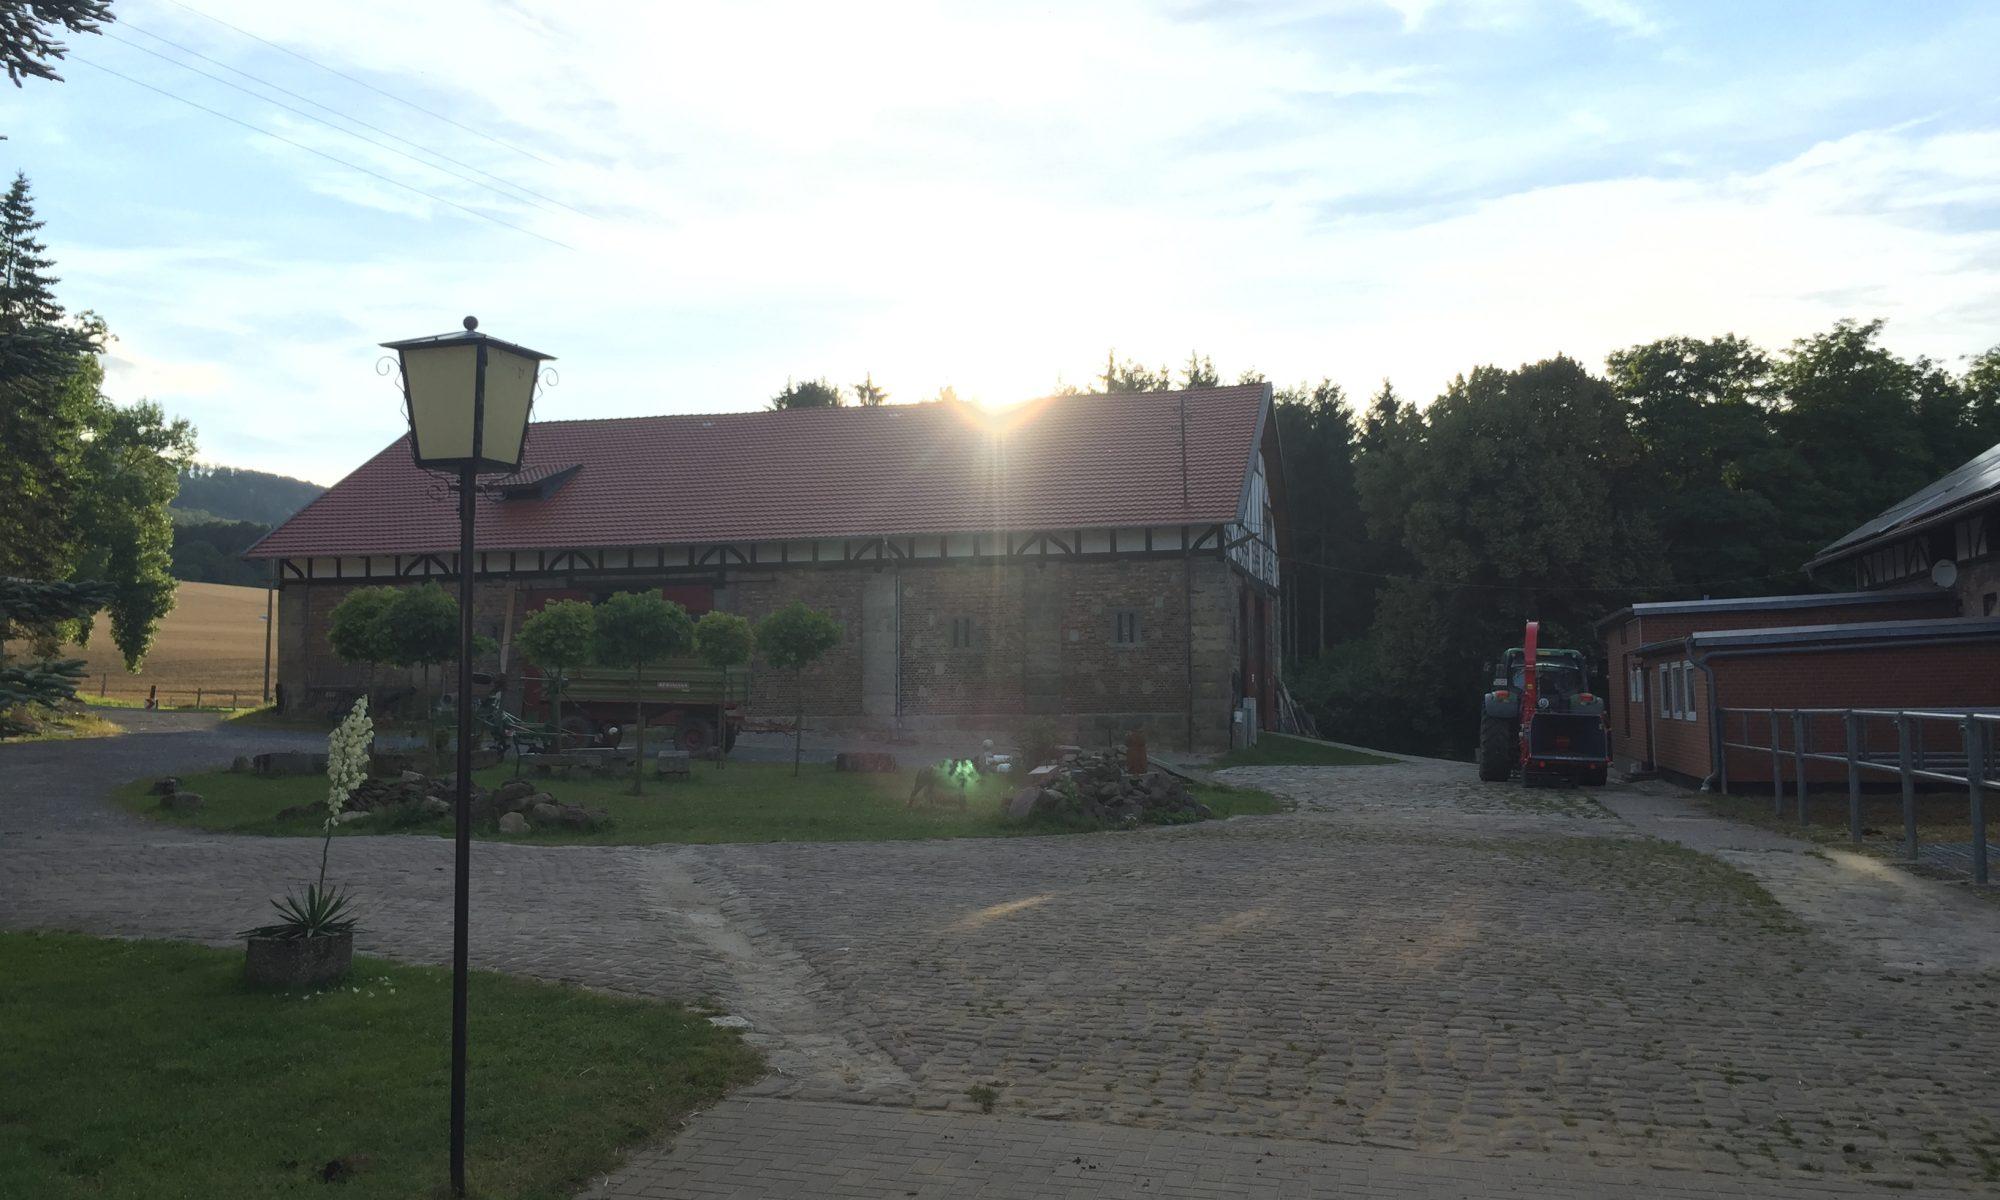 Rittergut Esbeck